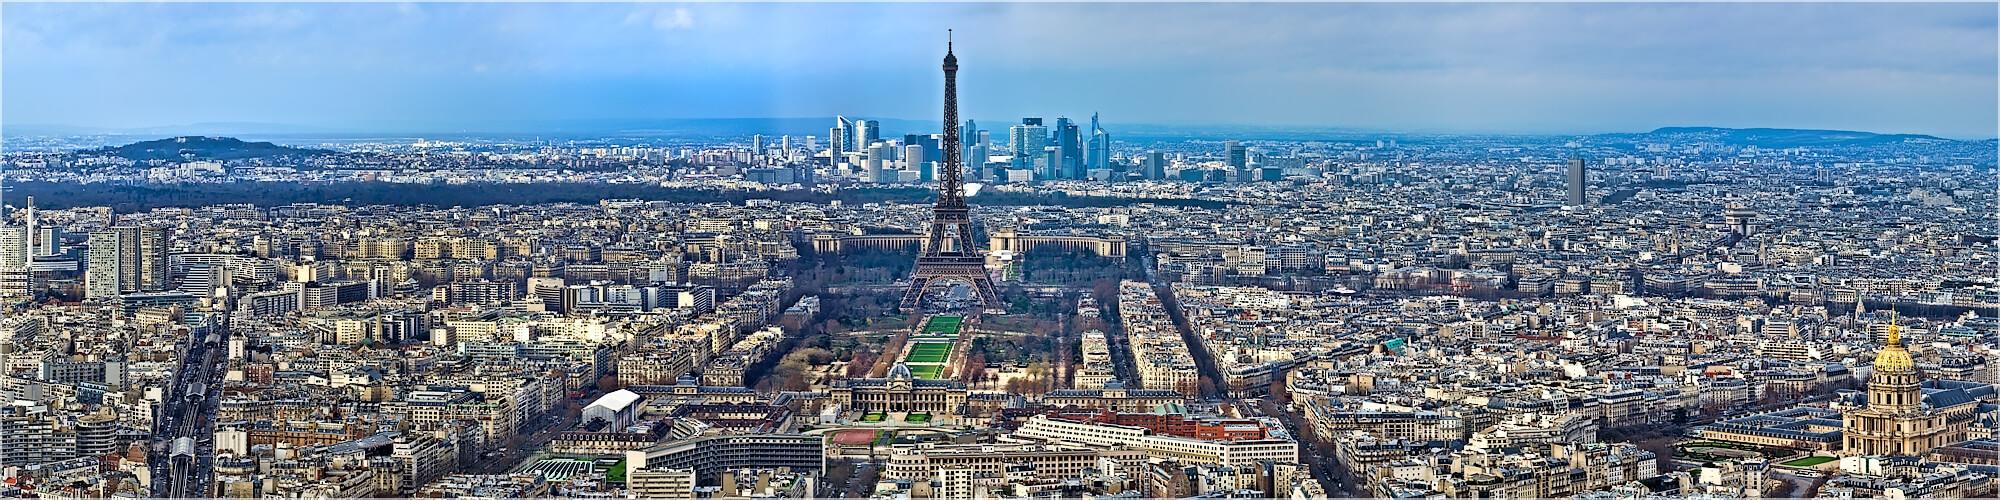 Panoramabild Marsfeld und Écol Paris Frankreich